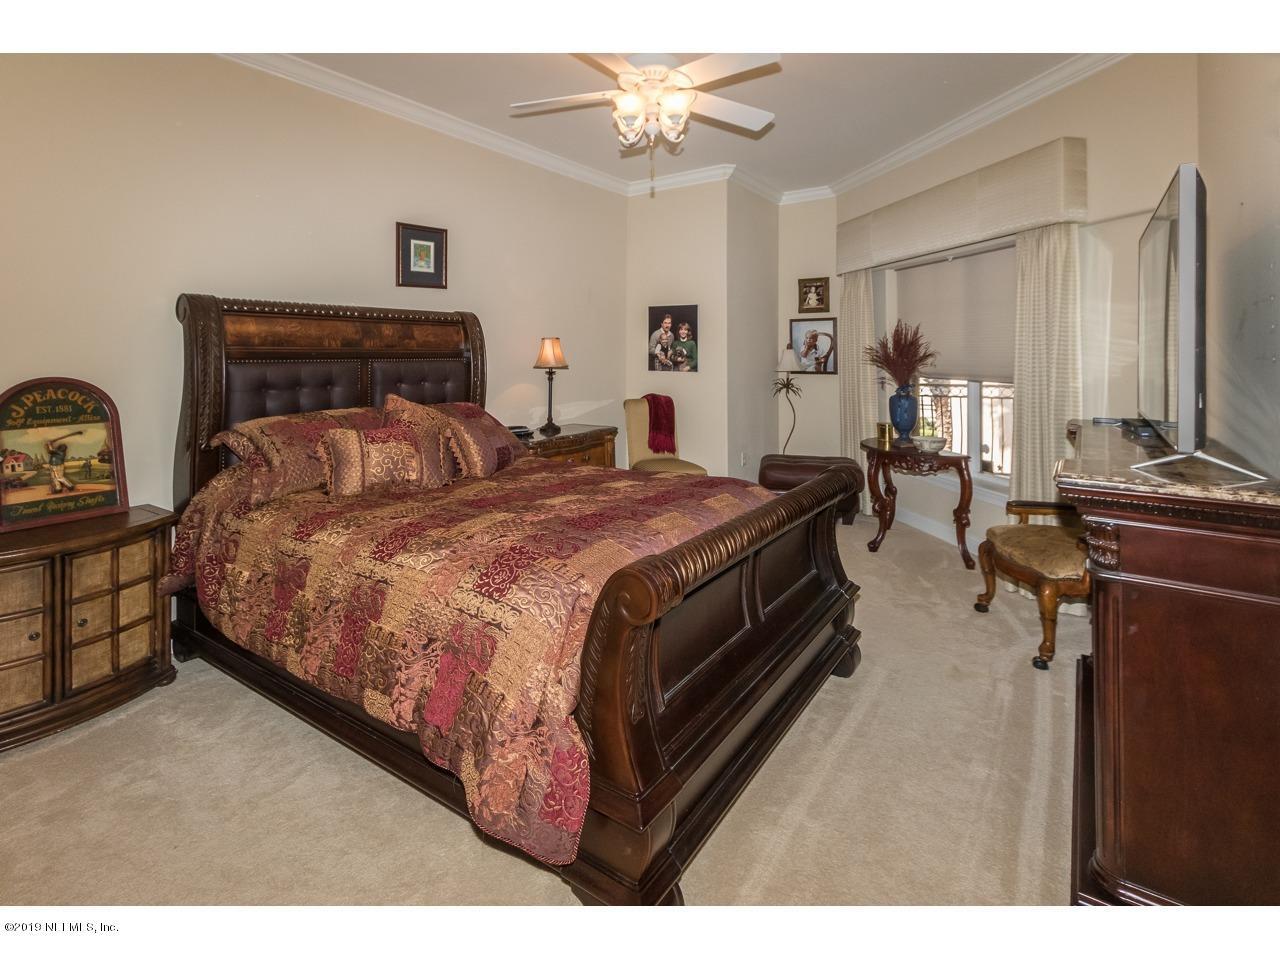 620 PALENCIA CLUB, ST AUGUSTINE, FLORIDA 32095, 3 Bedrooms Bedrooms, ,3 BathroomsBathrooms,Condo,For sale,PALENCIA CLUB,978161